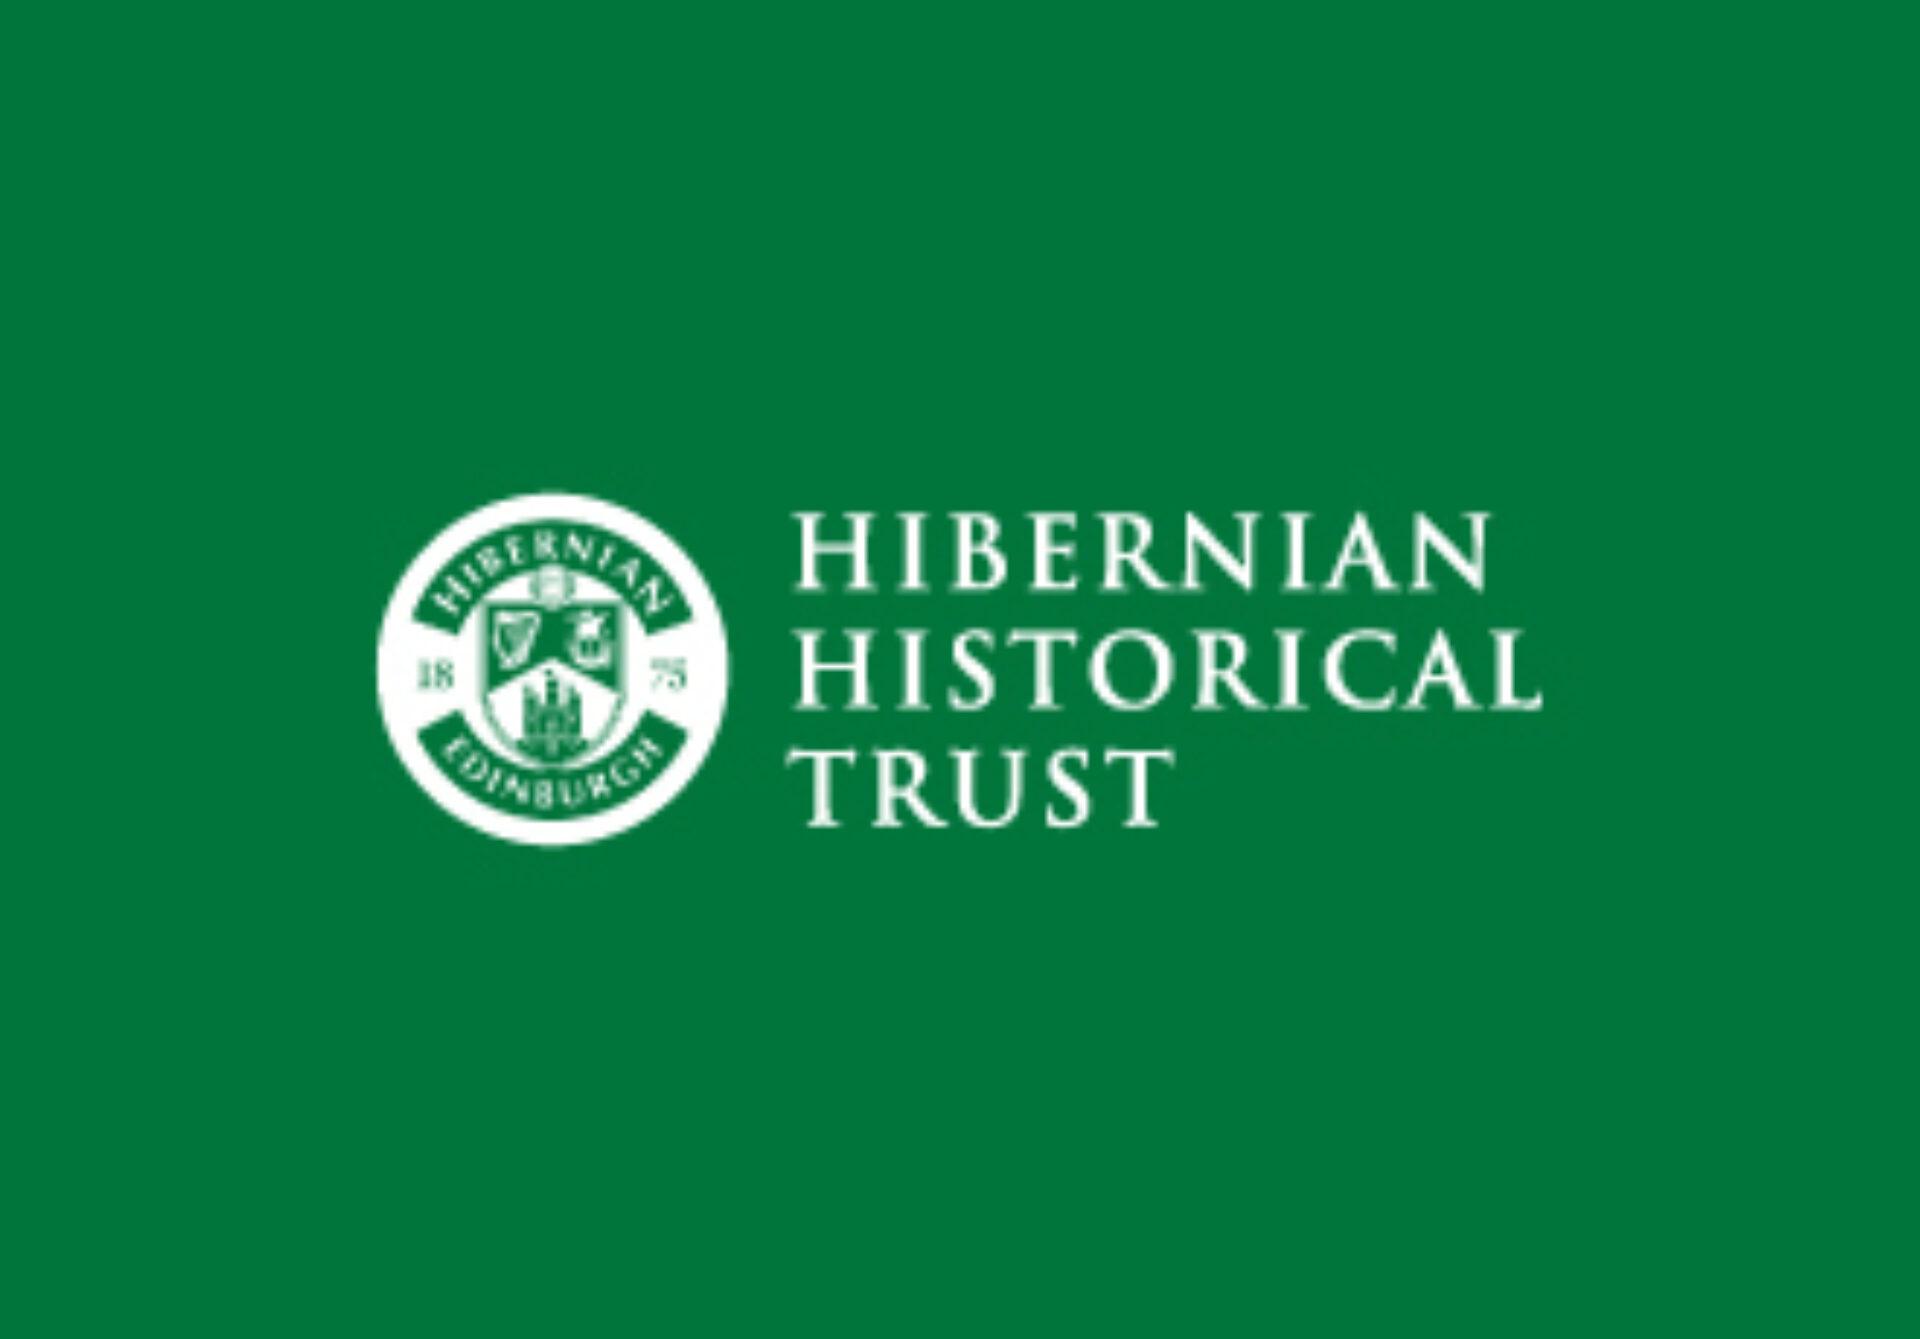 Hibs Hist Trust